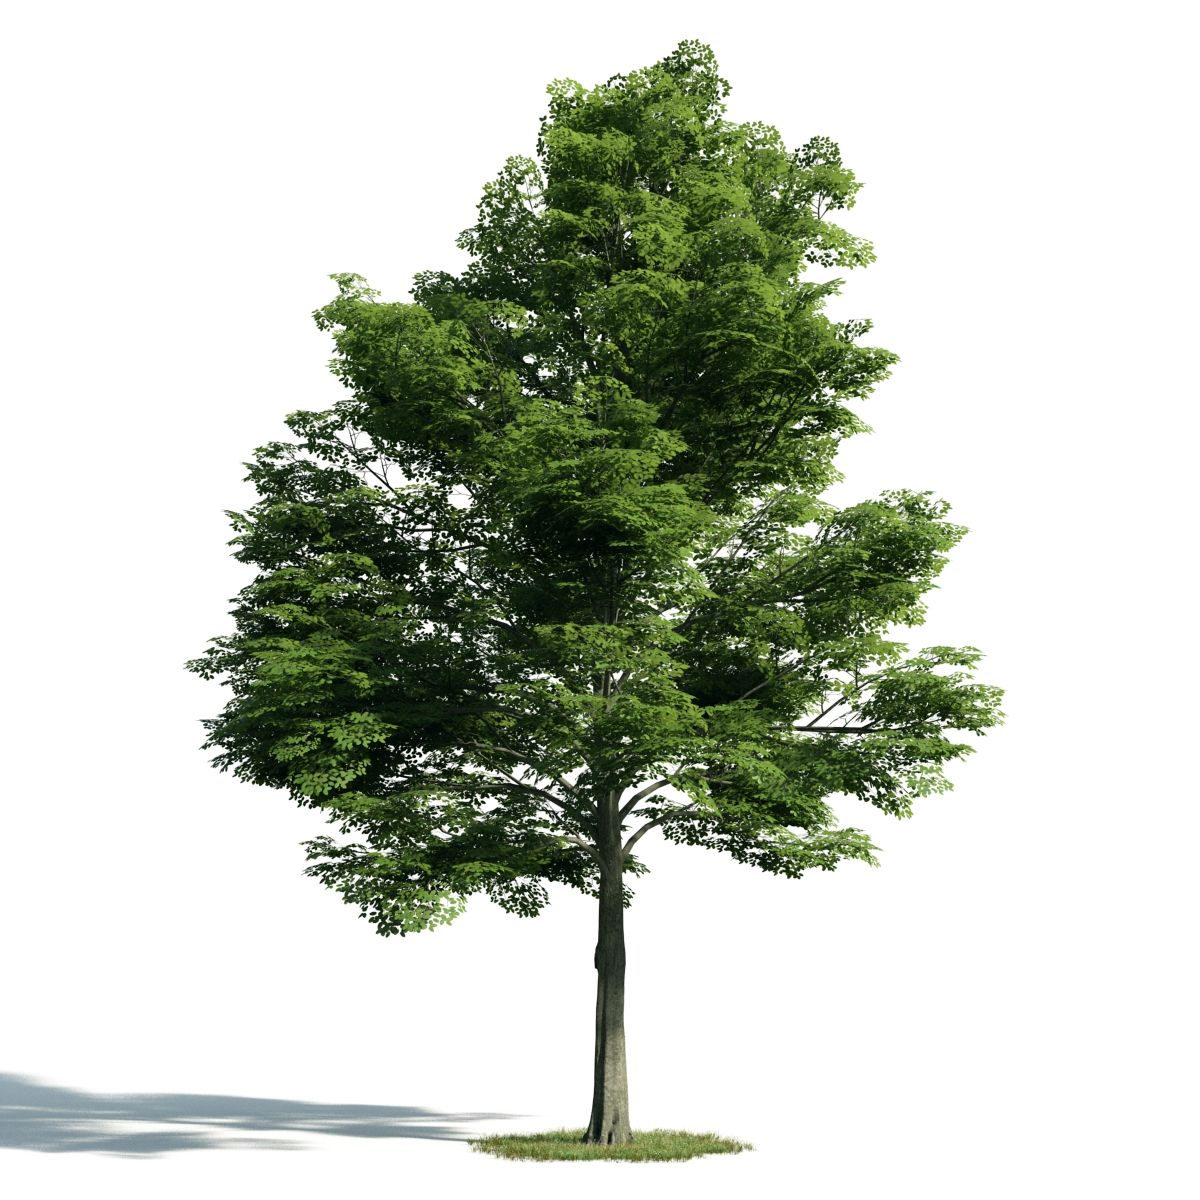 SKETCHUP] 3D TREE – VRAY READY | Warehouse